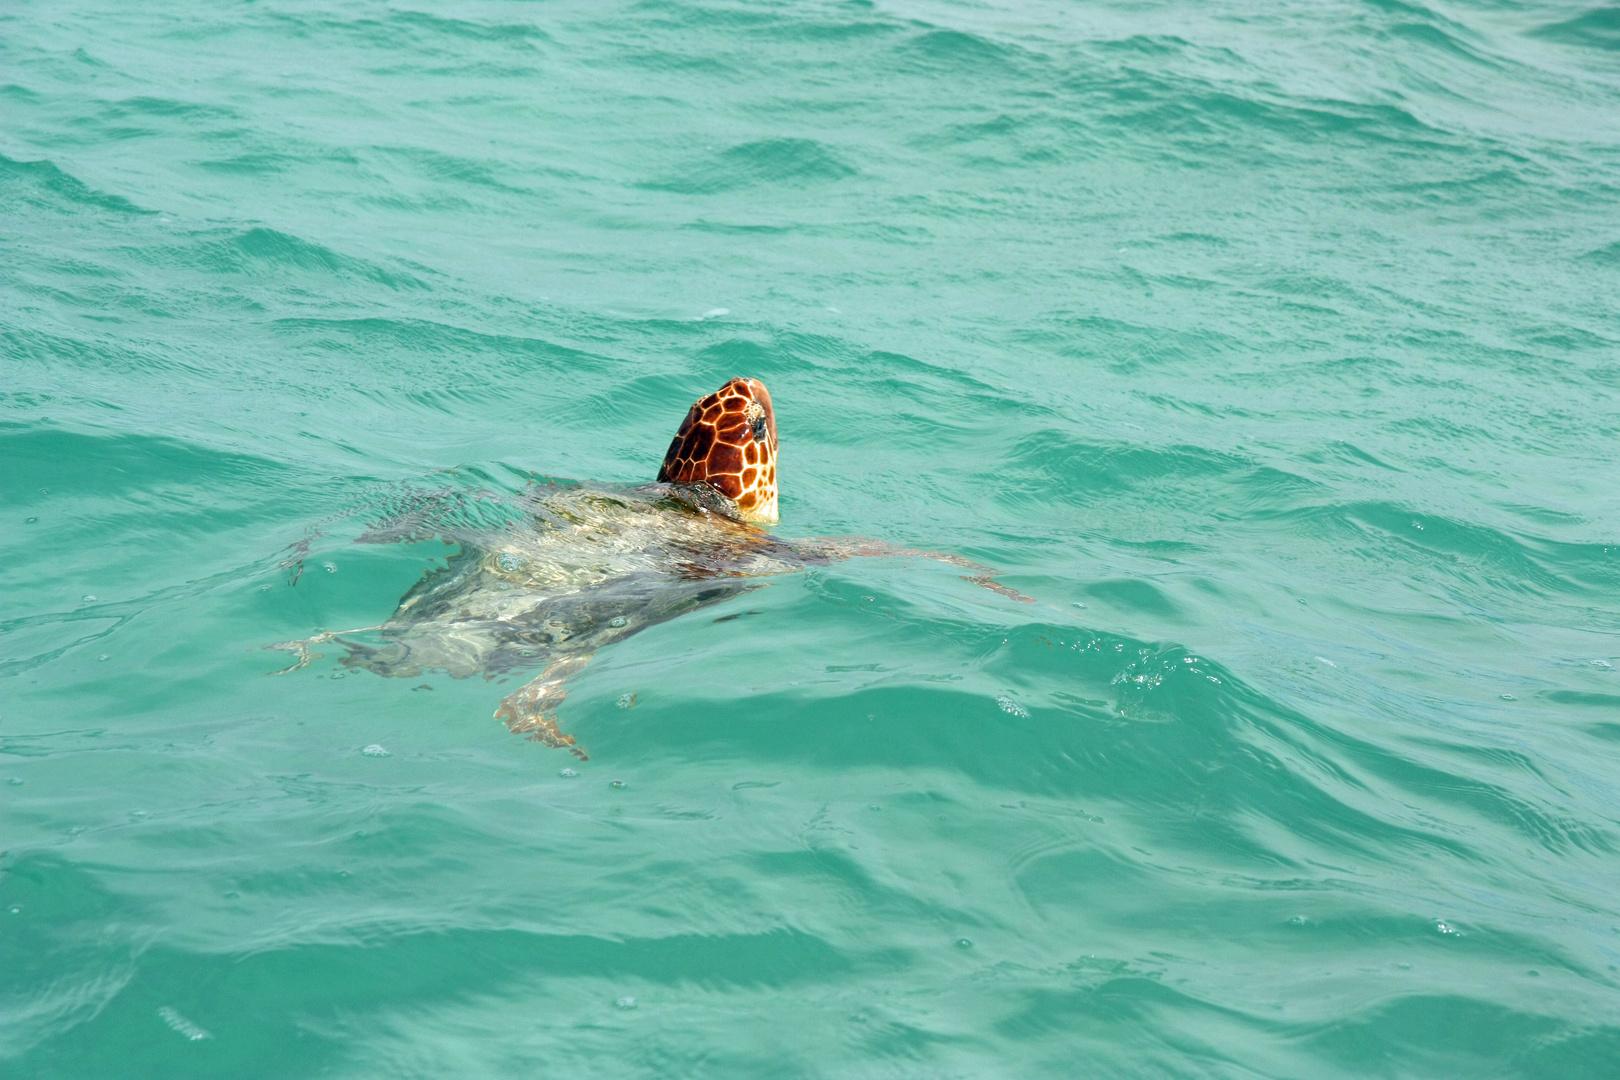 Meeresschildkröte in Mexico Sian Ka'an